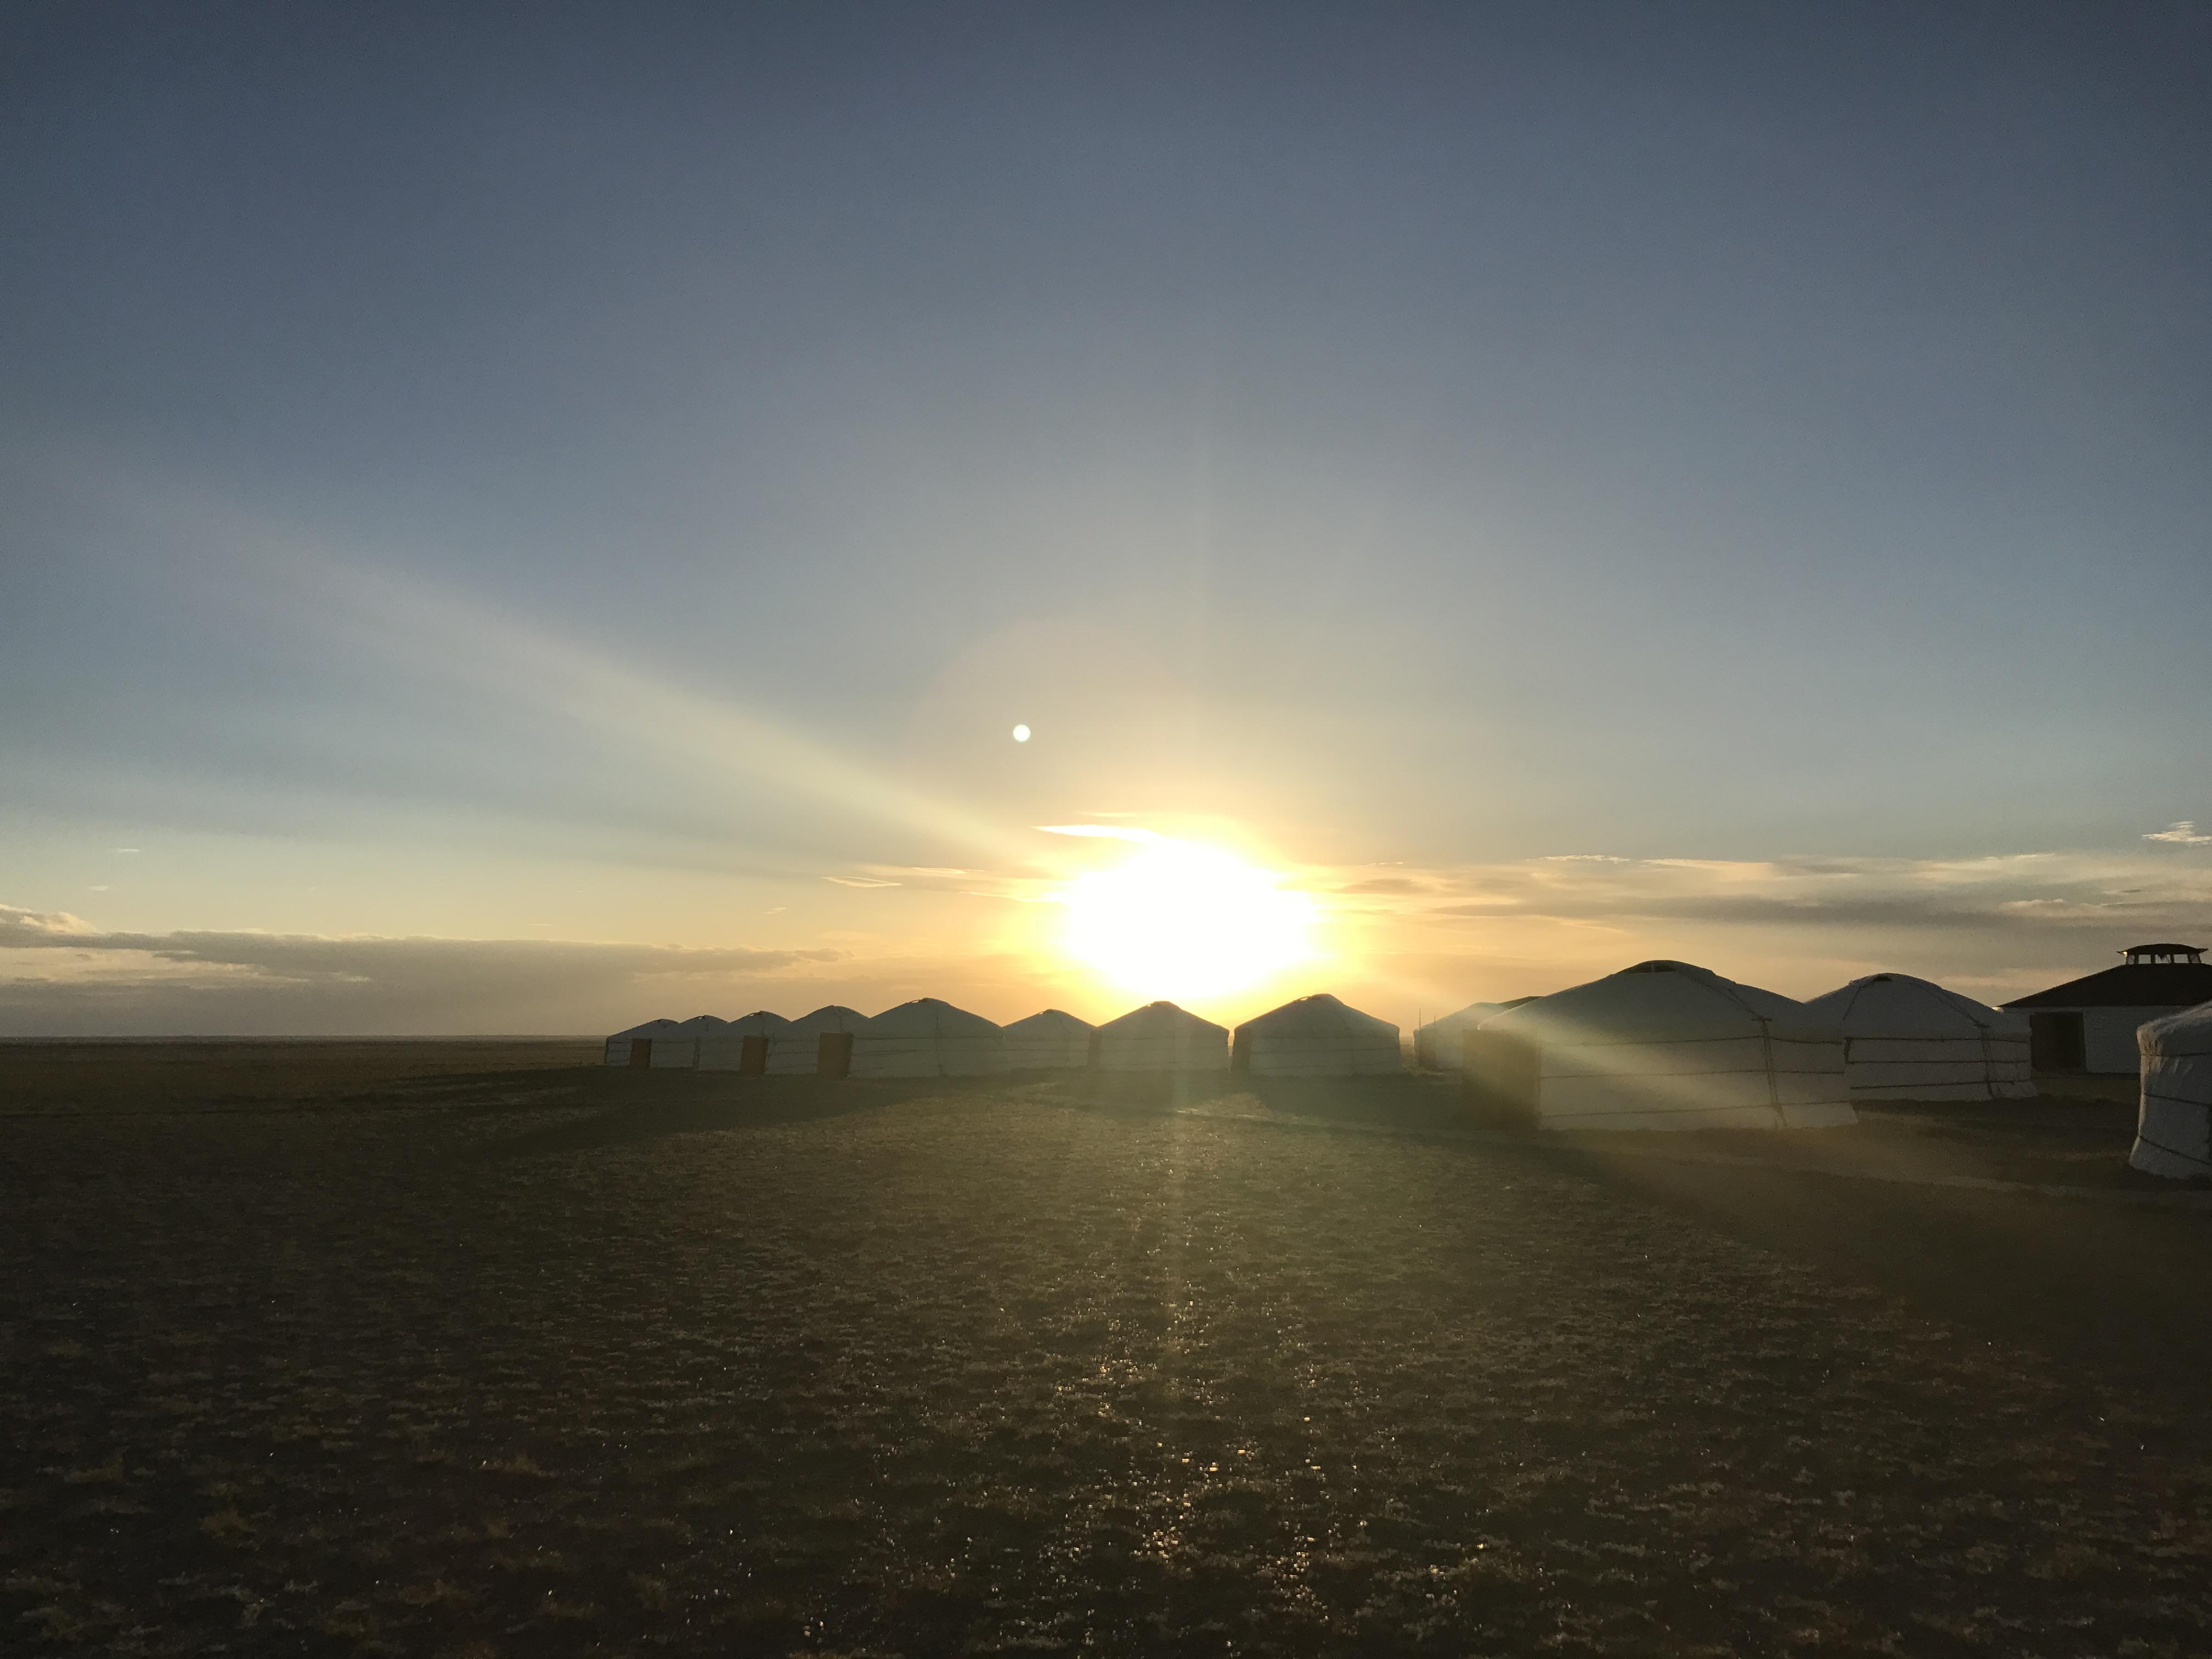 image of ger camp in Gobi Desert